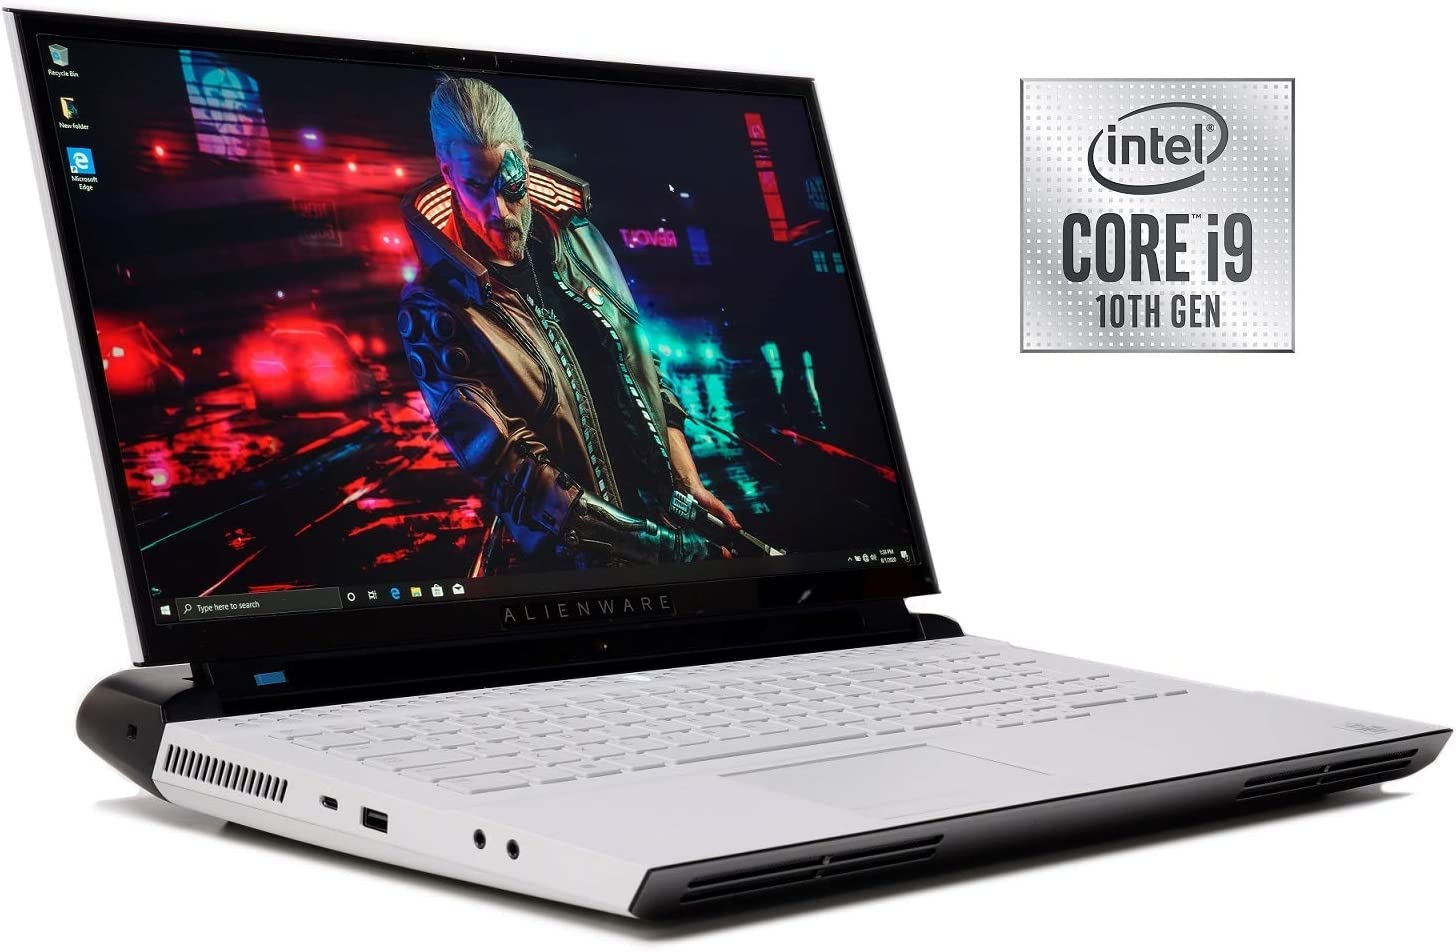 "New Impressive Area 51m R2 Gaming Laptop 10th Gen i9 10900K 10-Core 5.3GHz w/Thermal Velocity Boost RTX 2080 Super 8GB 17.3"" 4K UHD 500-nits 100% Adobe RGB Tobii Eyetracking (1TB SSD|32GB RAM|10 PRO)"